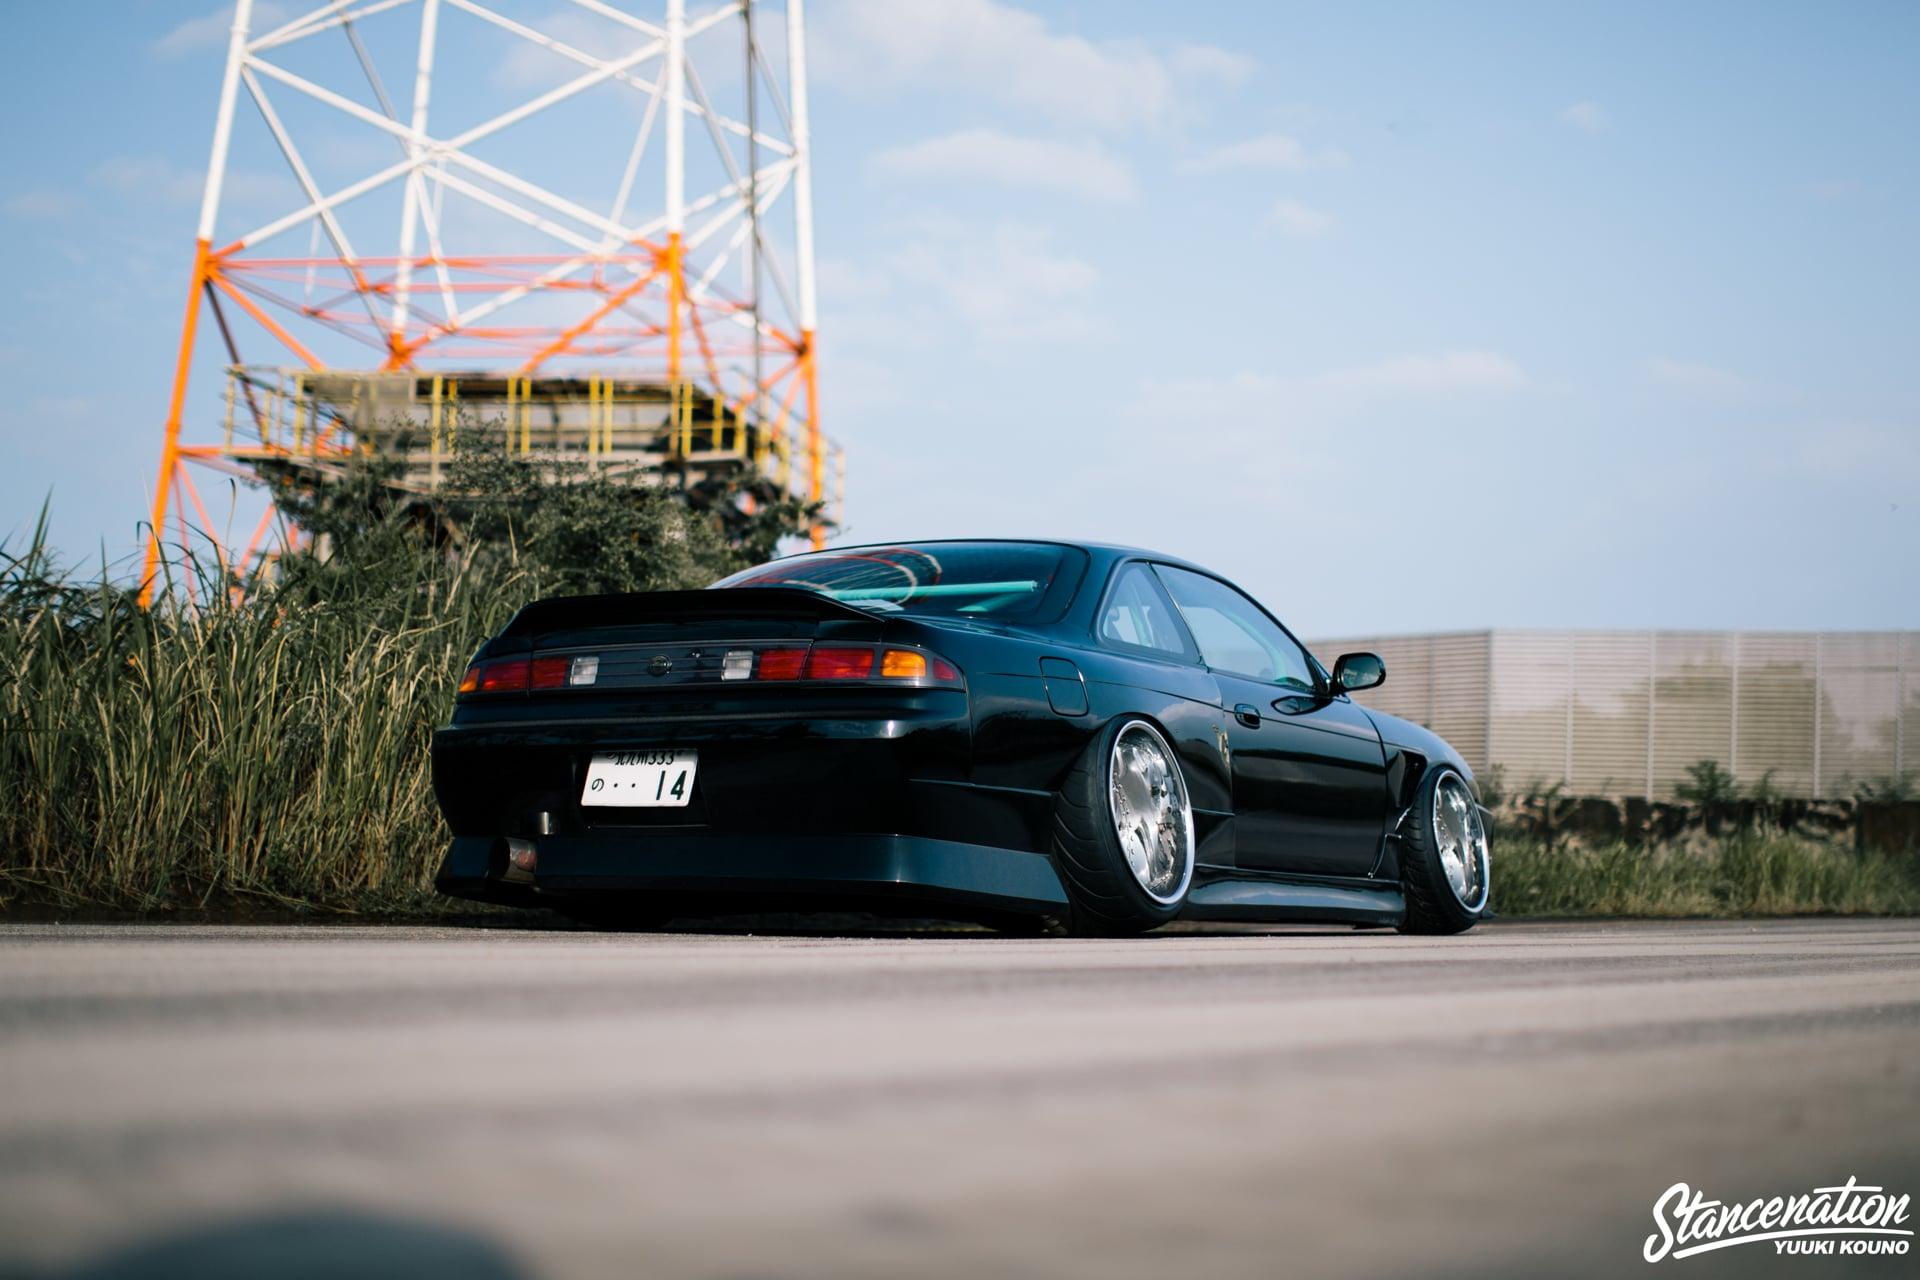 Shota's Nissan Silvia S14